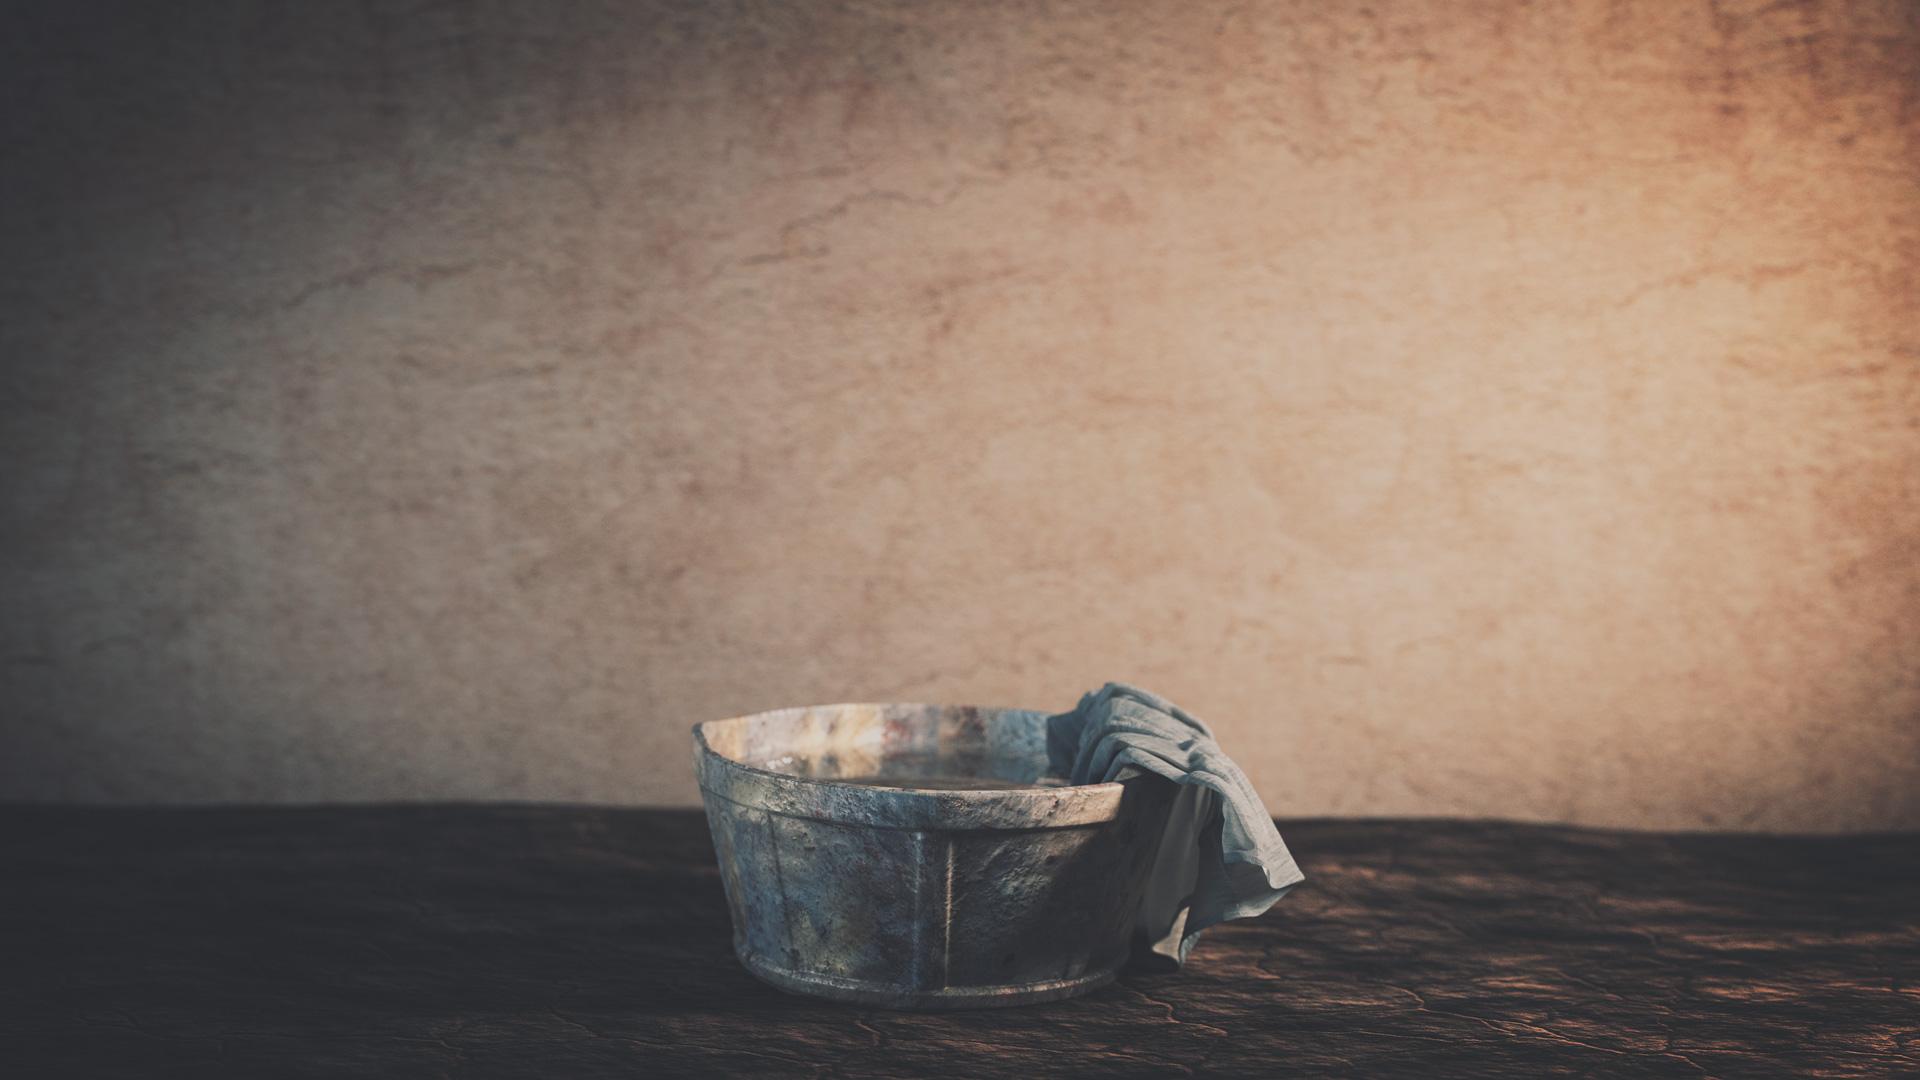 Jesus Washed Judas' Feet - Olive Tree Blog